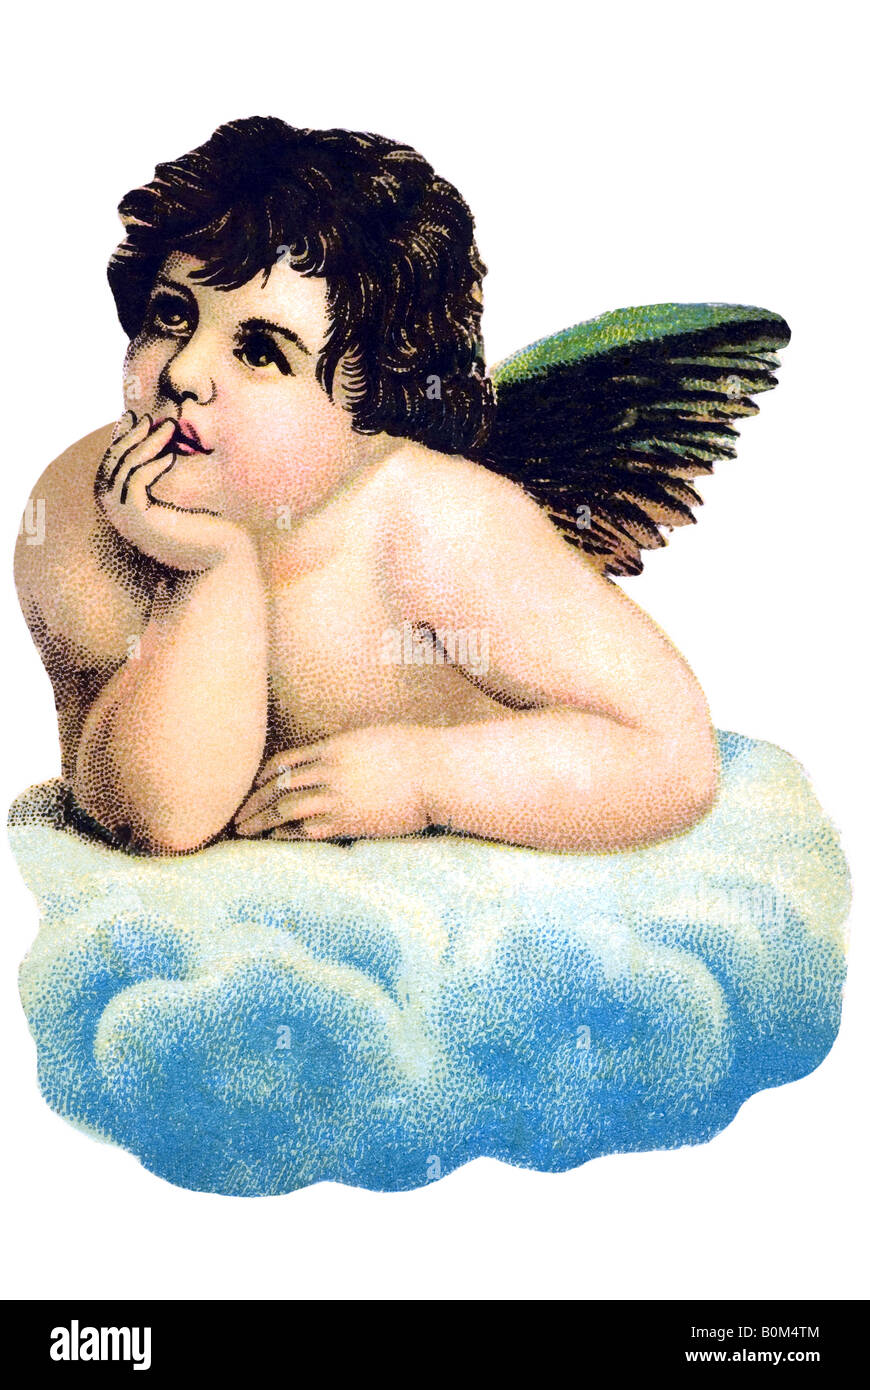 classic children angel on cloud Michelangelo Buonarroti like motive 19th century Germany - Stock Image